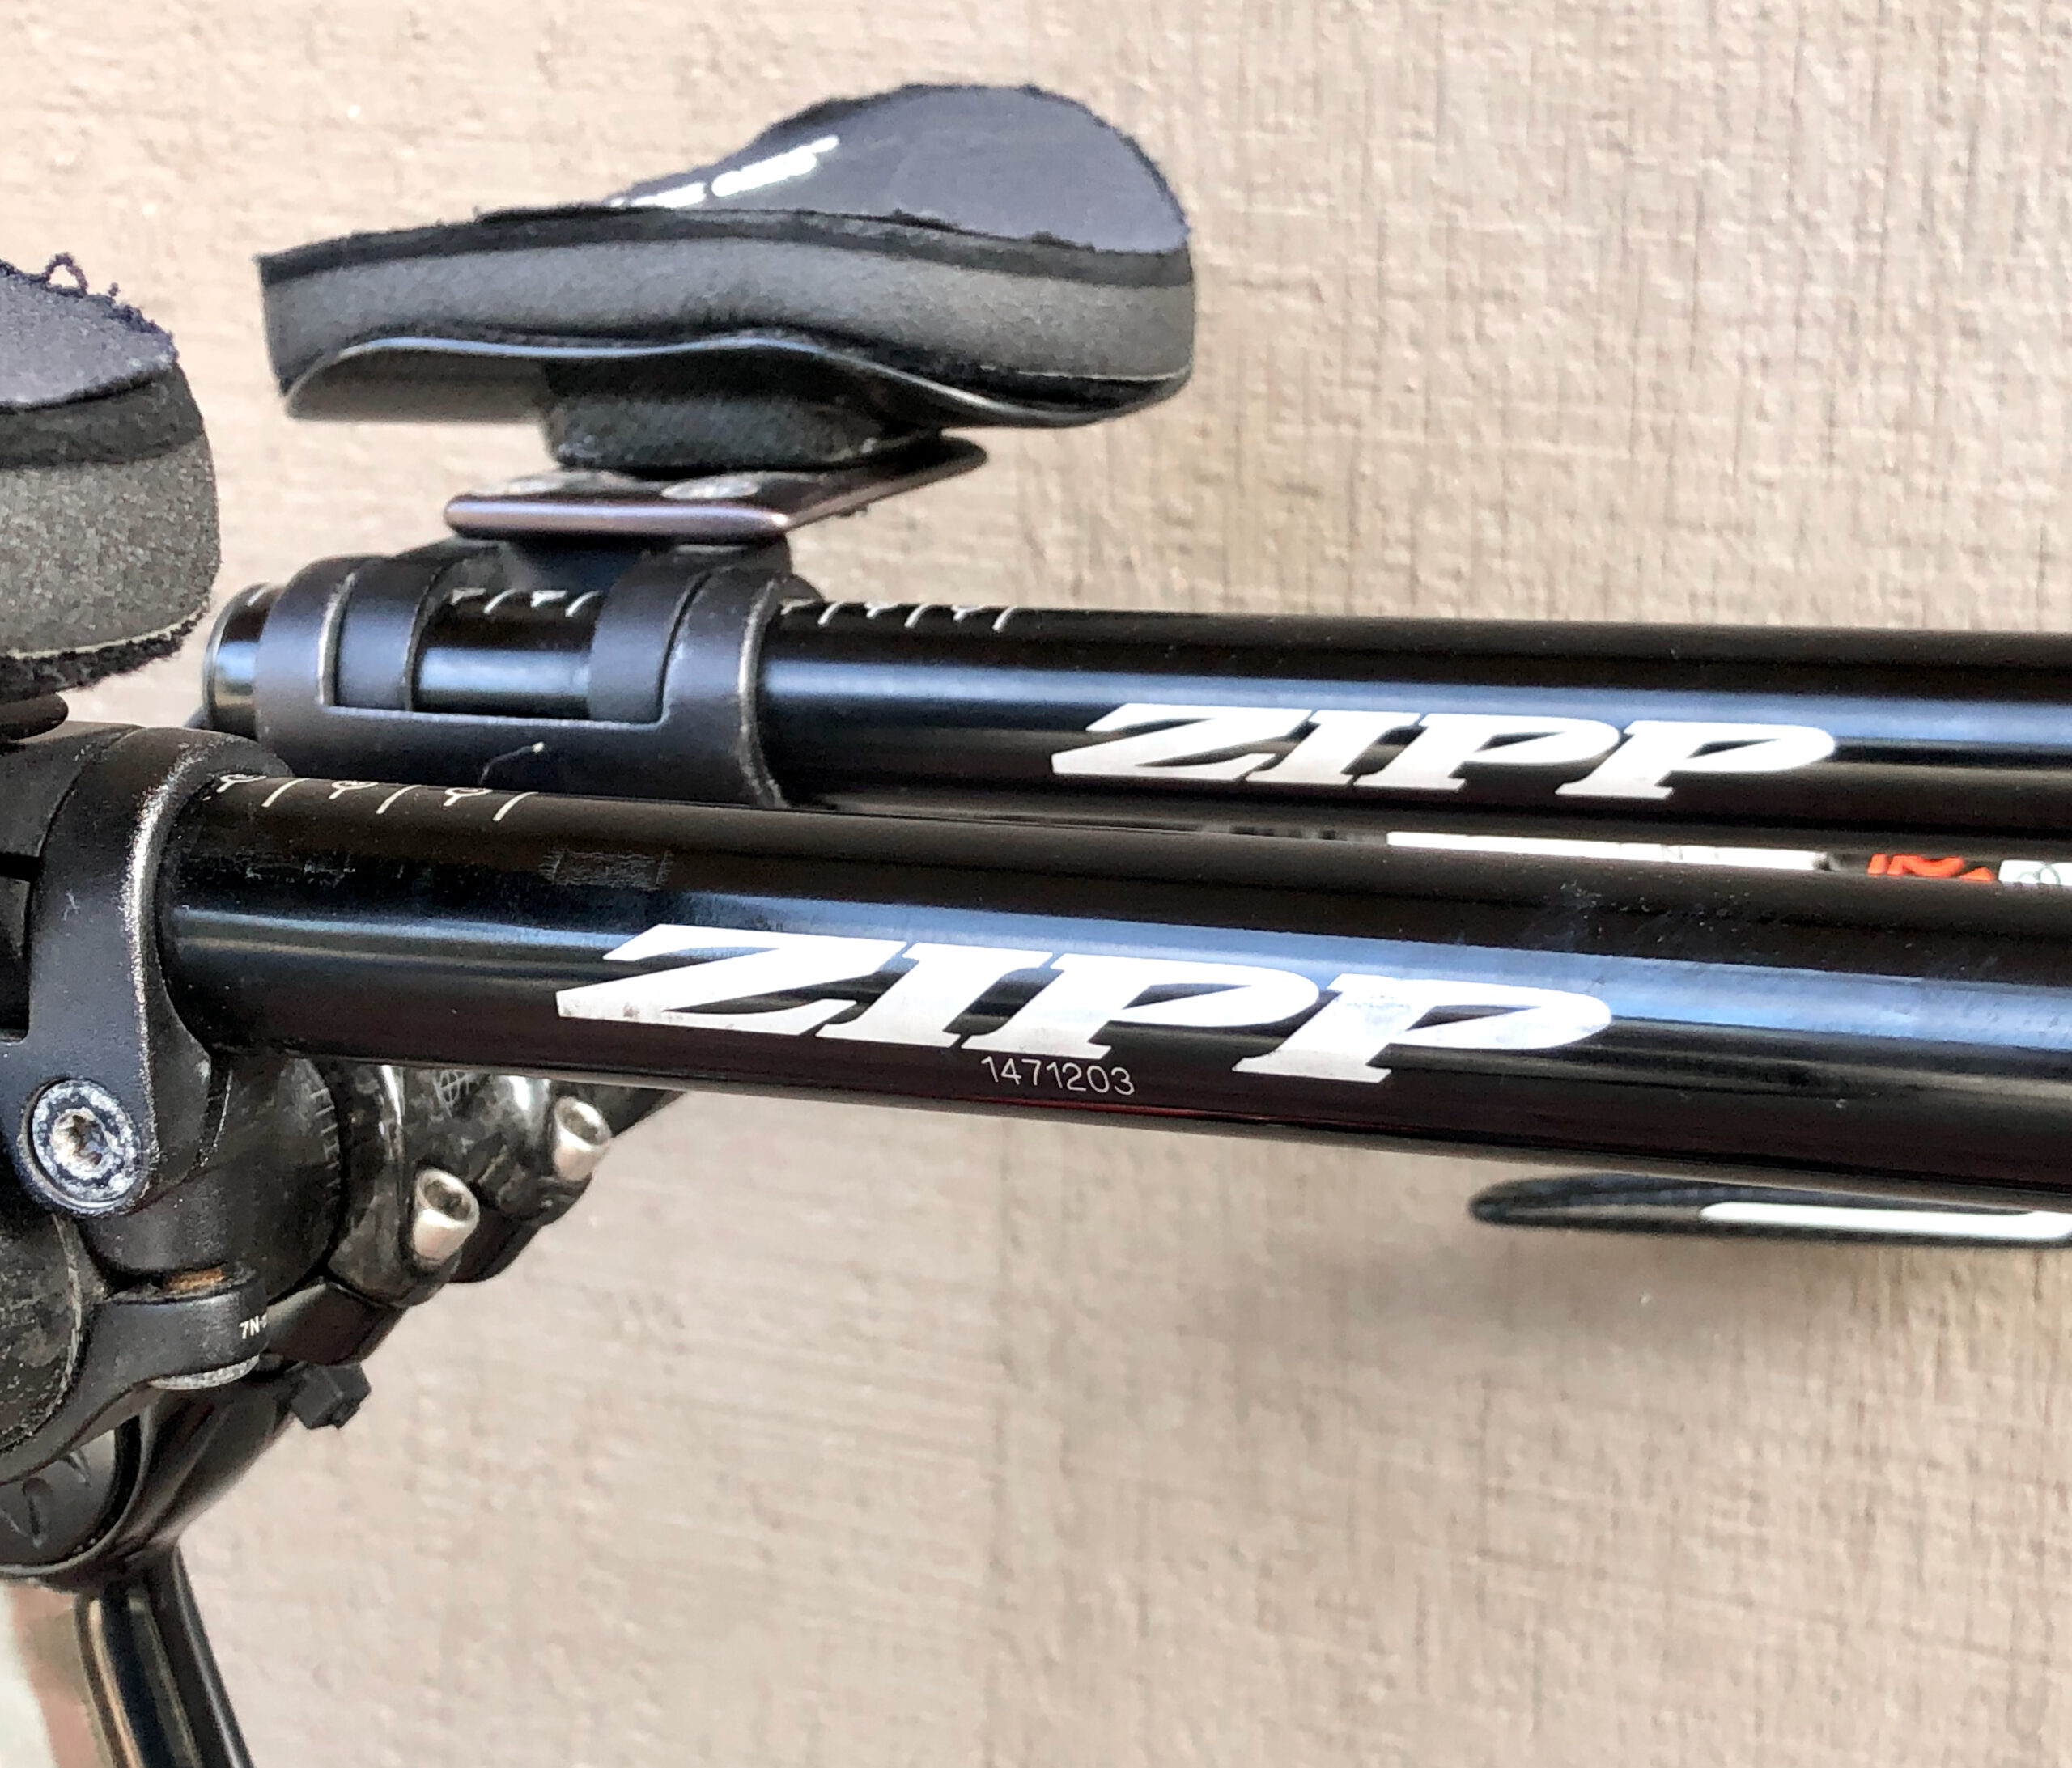 Felt DA Dura Ace 9000 Di2 Full Carbon Tri Triathlon TT Aero Bike 11 sp - 56 cm